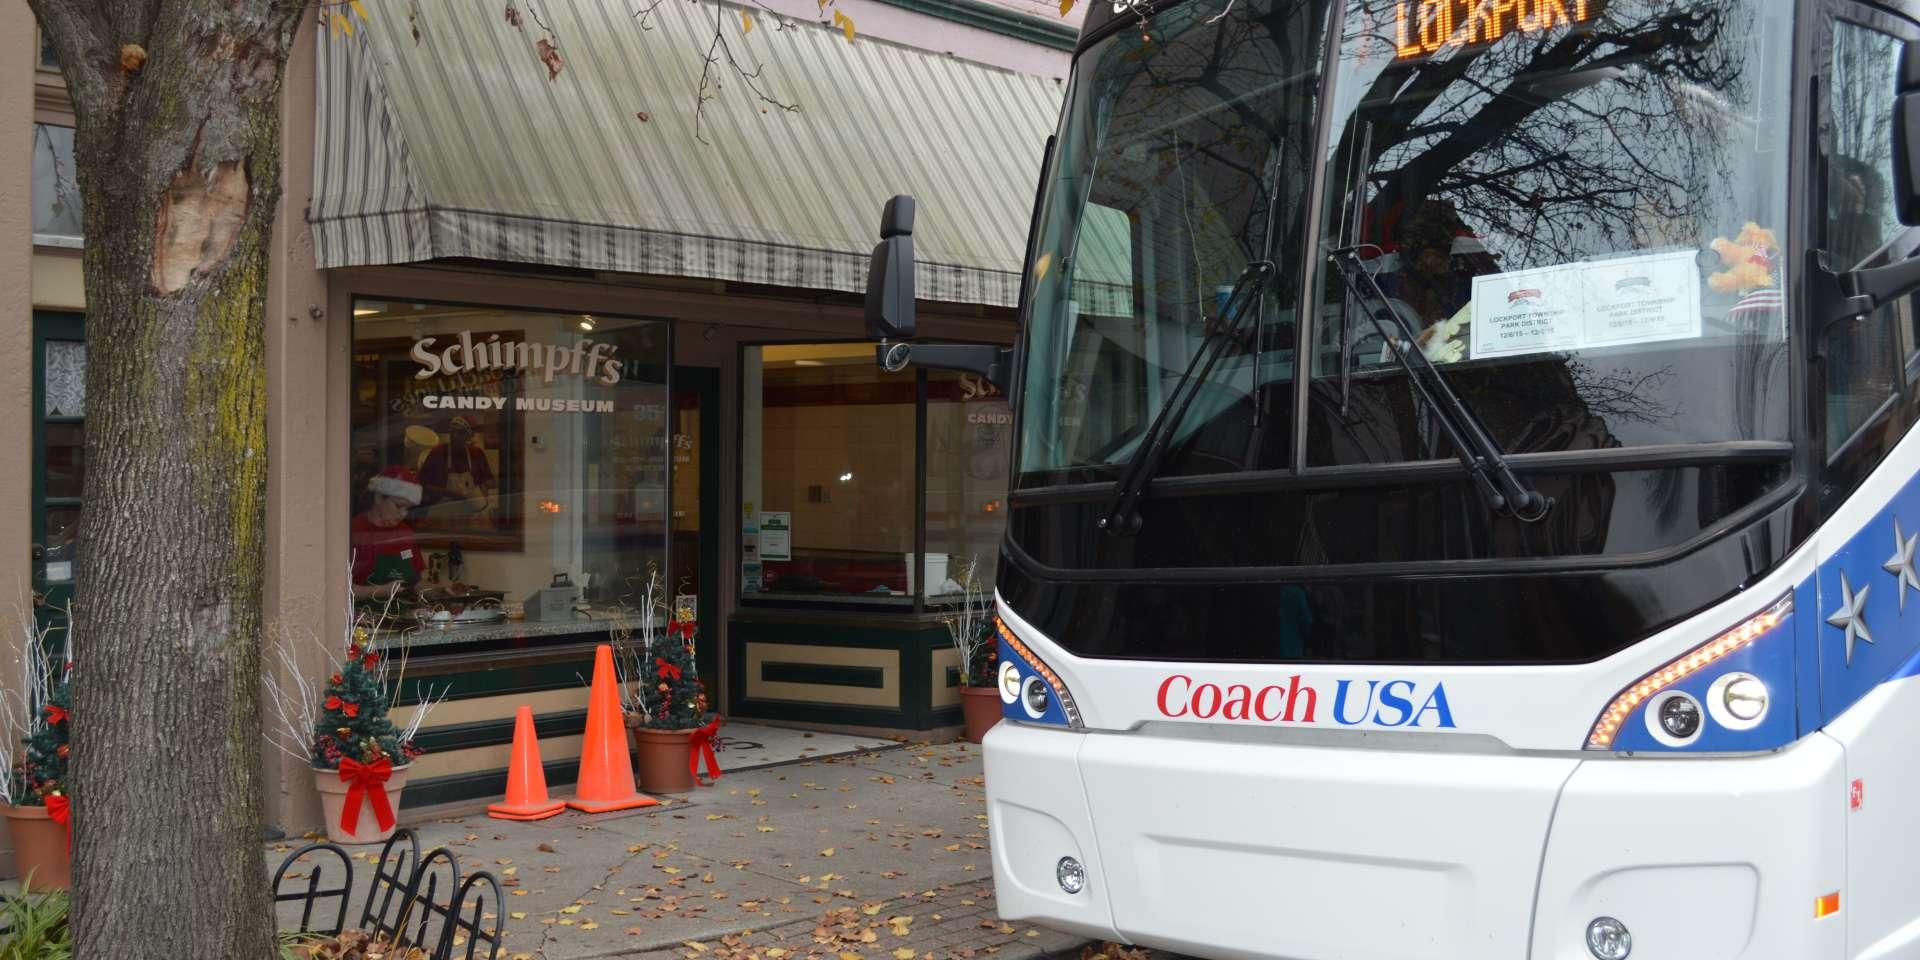 Coach USA Tours